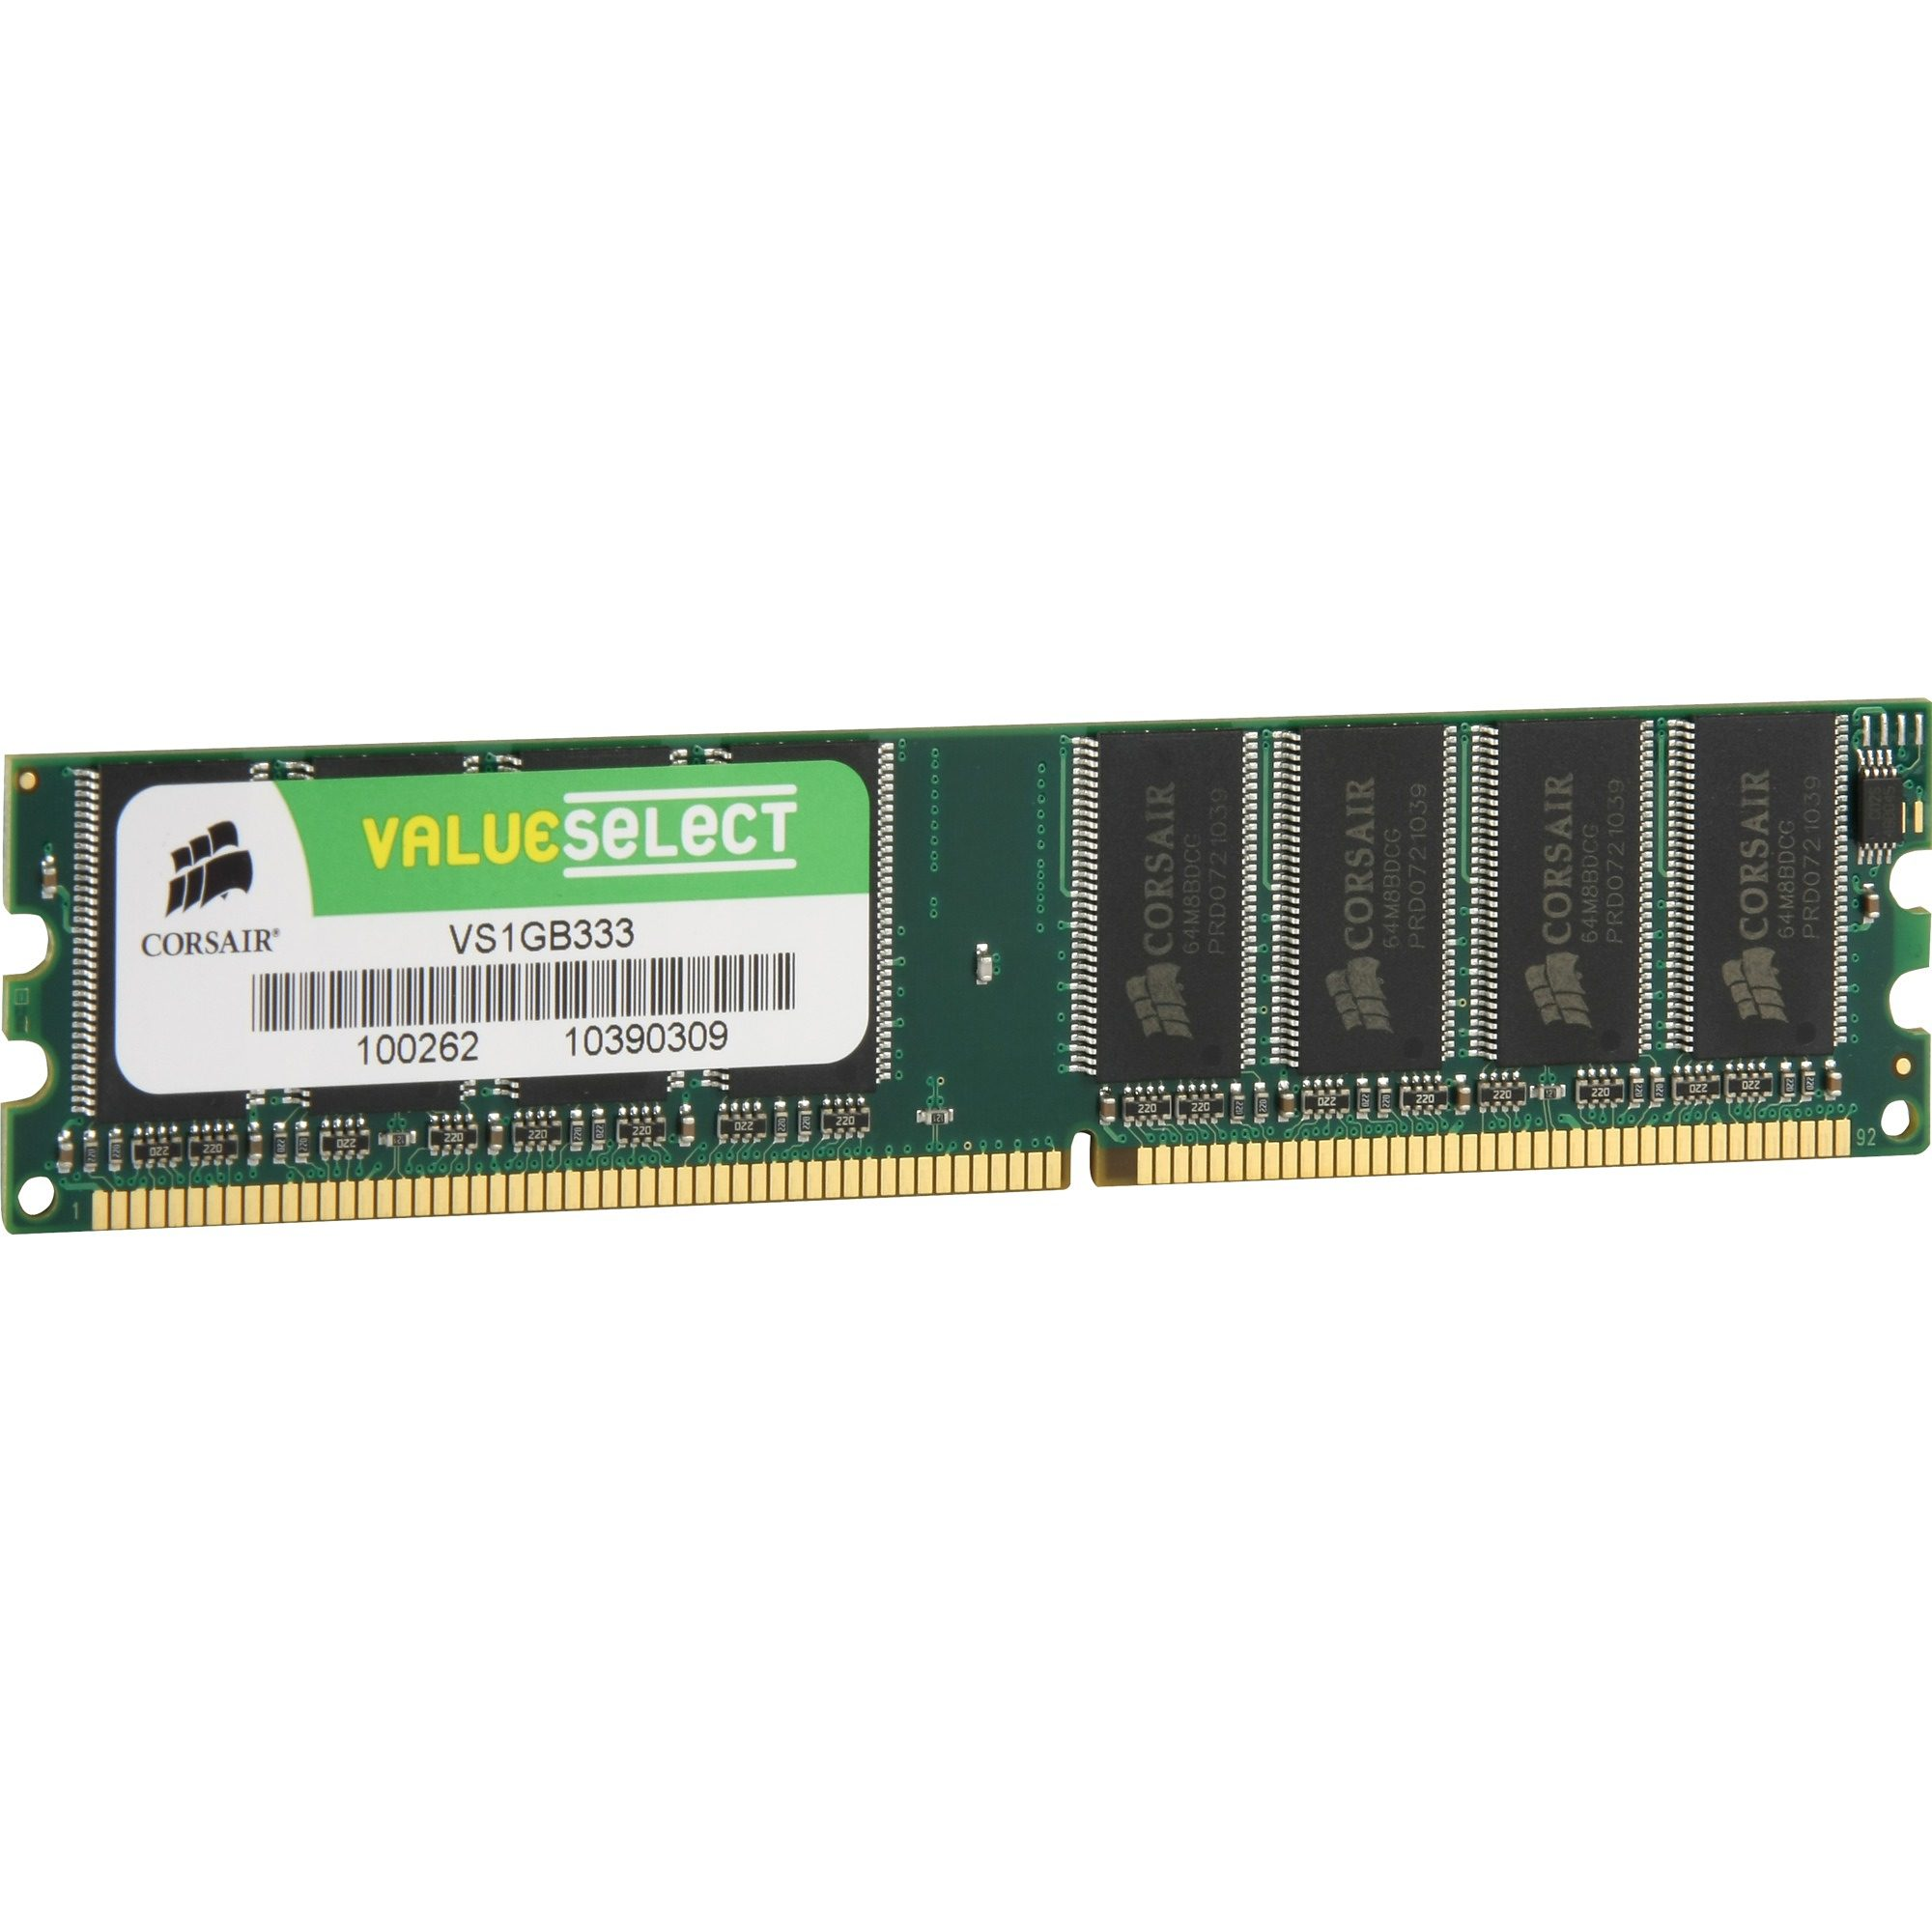 Corsair ValueSelect Arbeitsspeicher »DIMM 1 GB DDR-333«